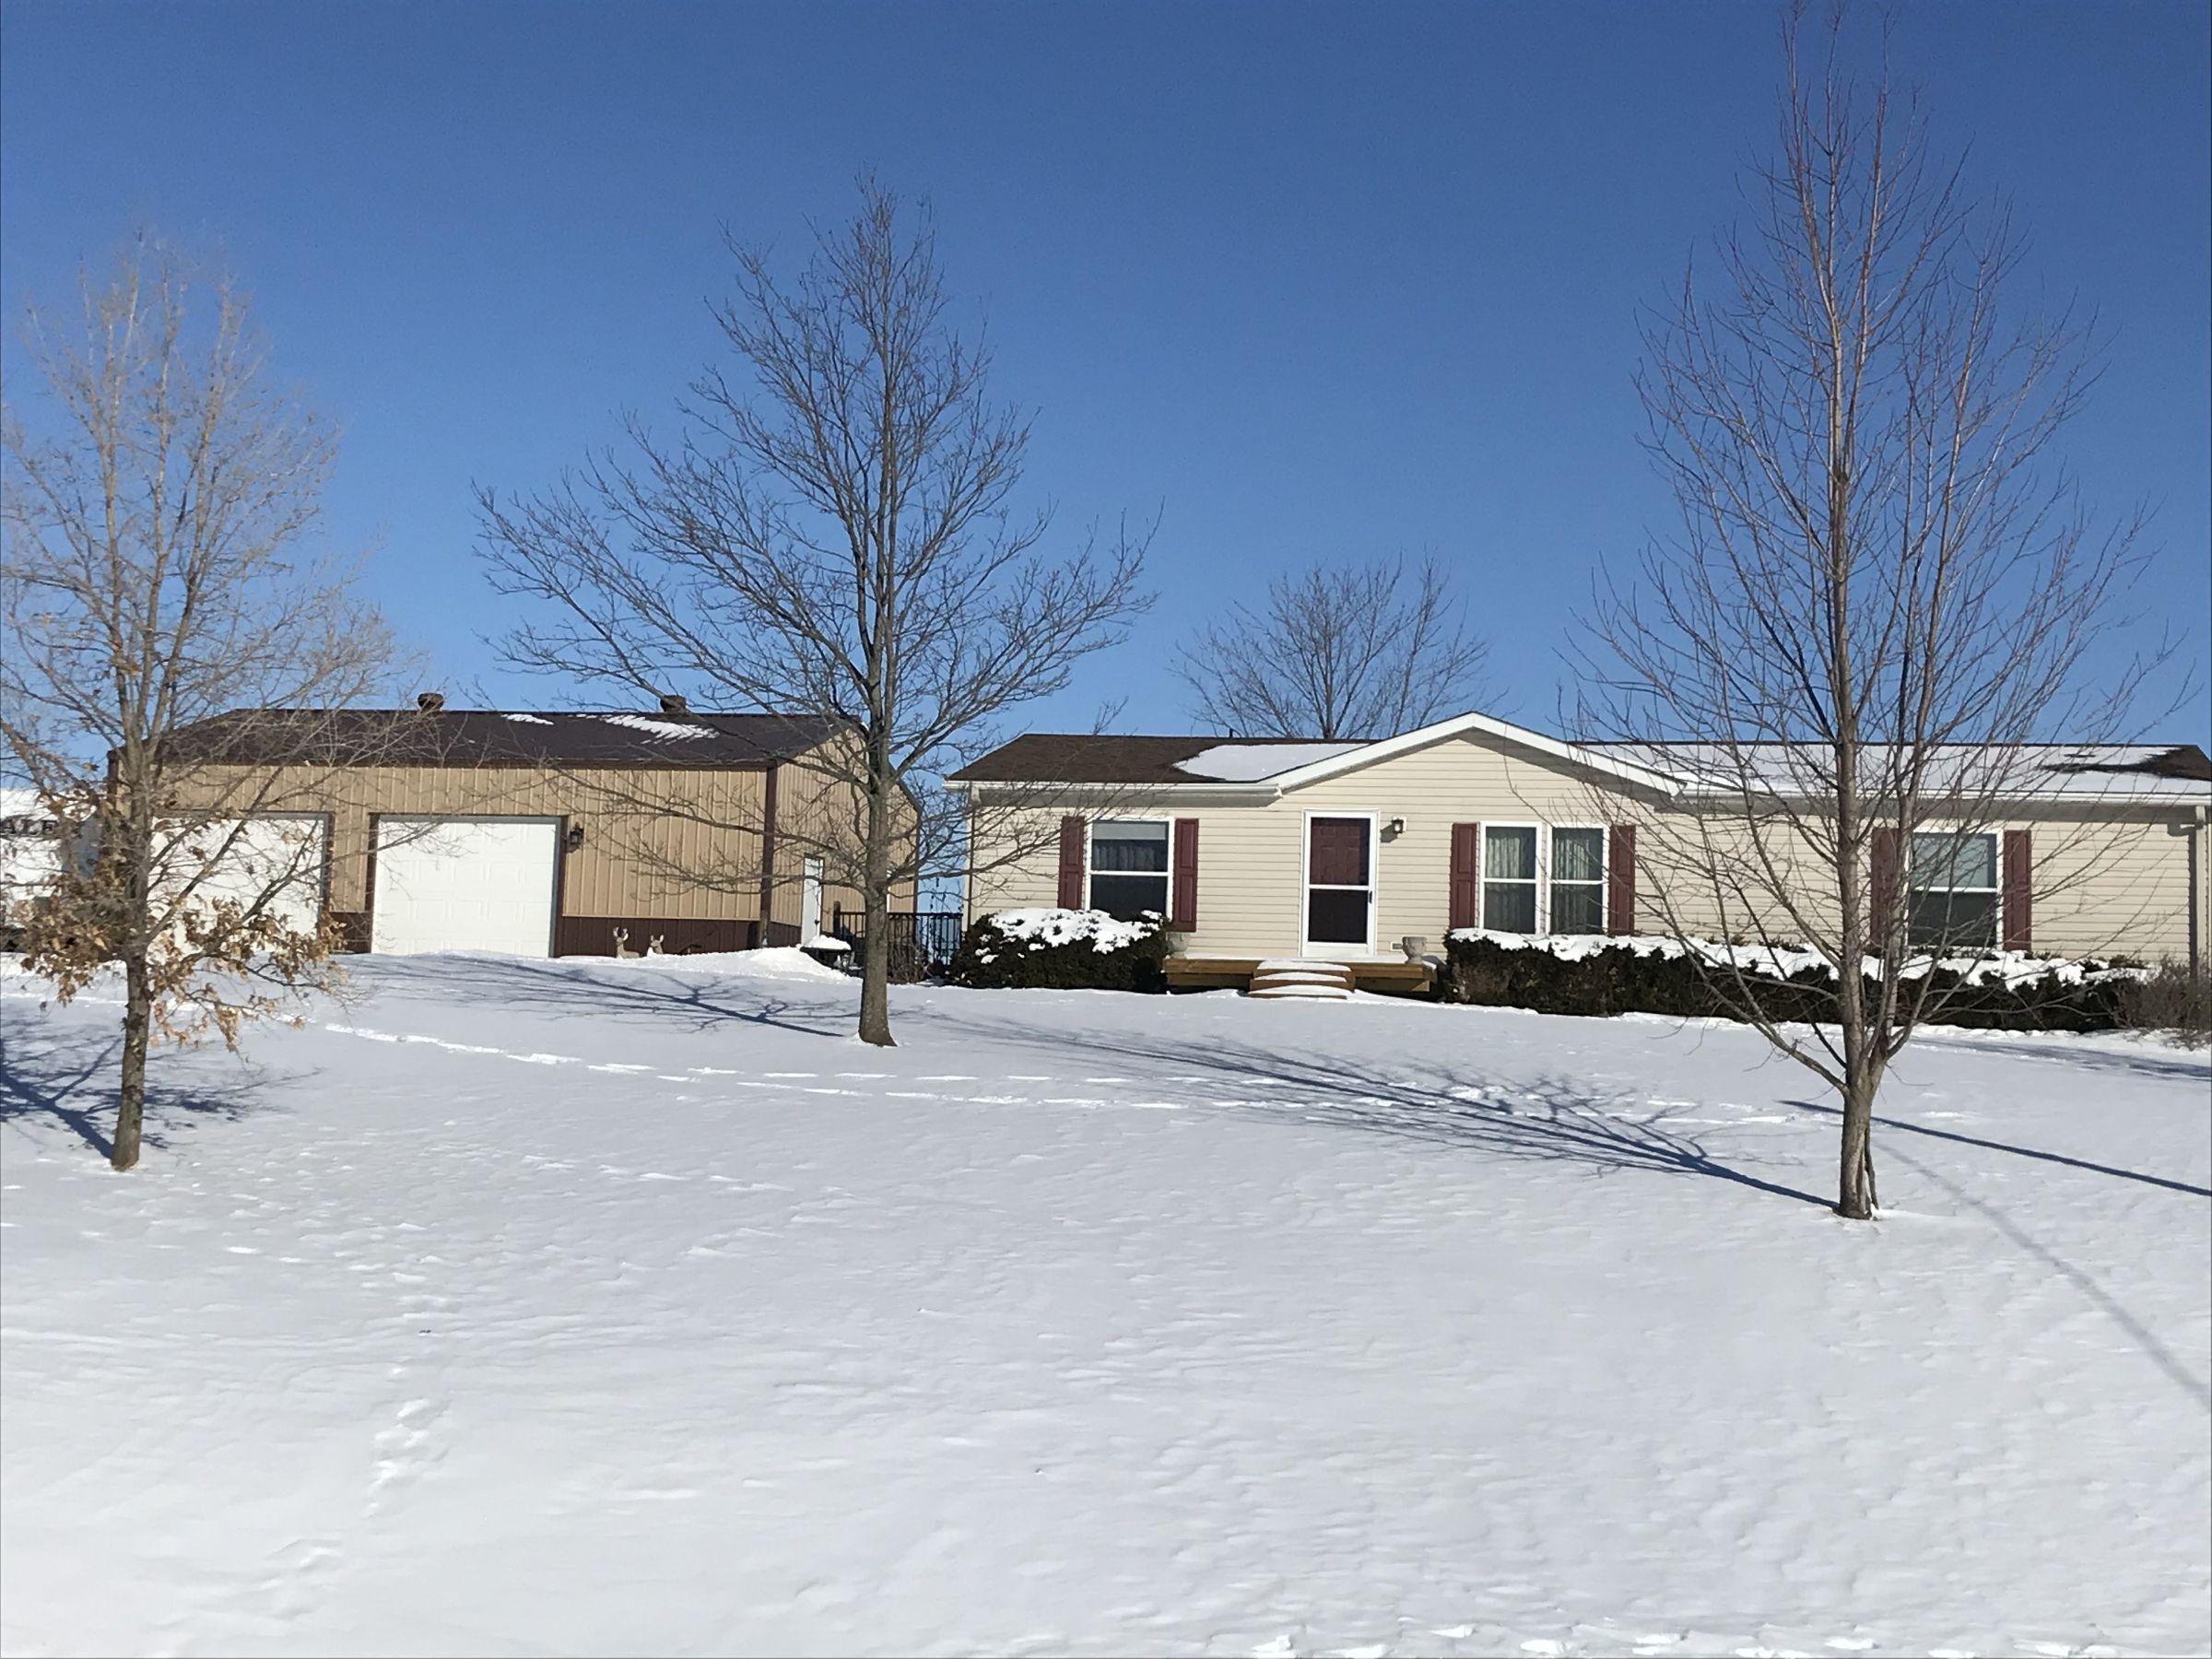 residential-warren-county-iowa-7-acres-listing-number-15327-2-2021-02-16-233209.jpg